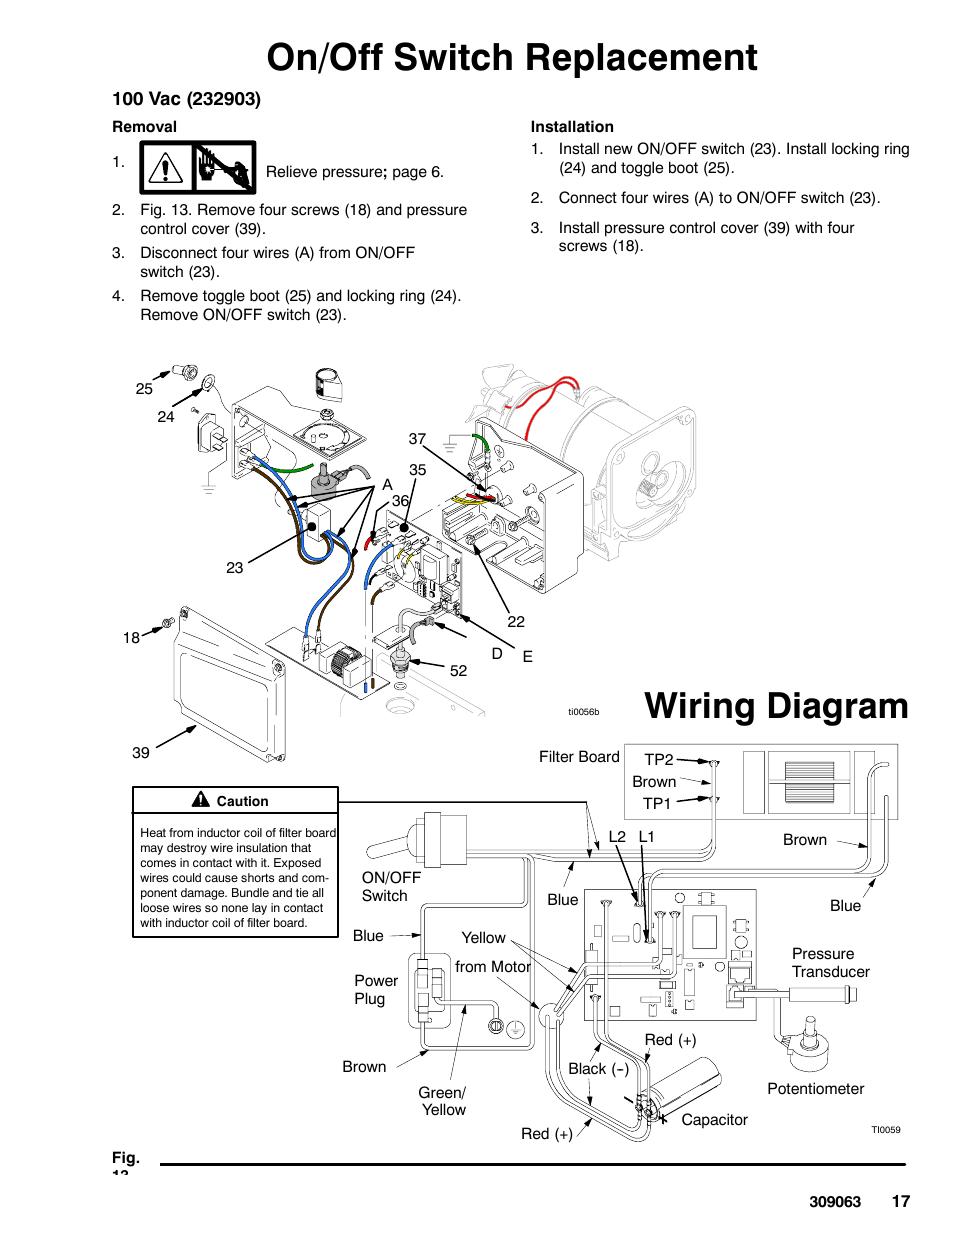 Notifier Fcm 1 Wiring Diagram from www.manualsdir.com